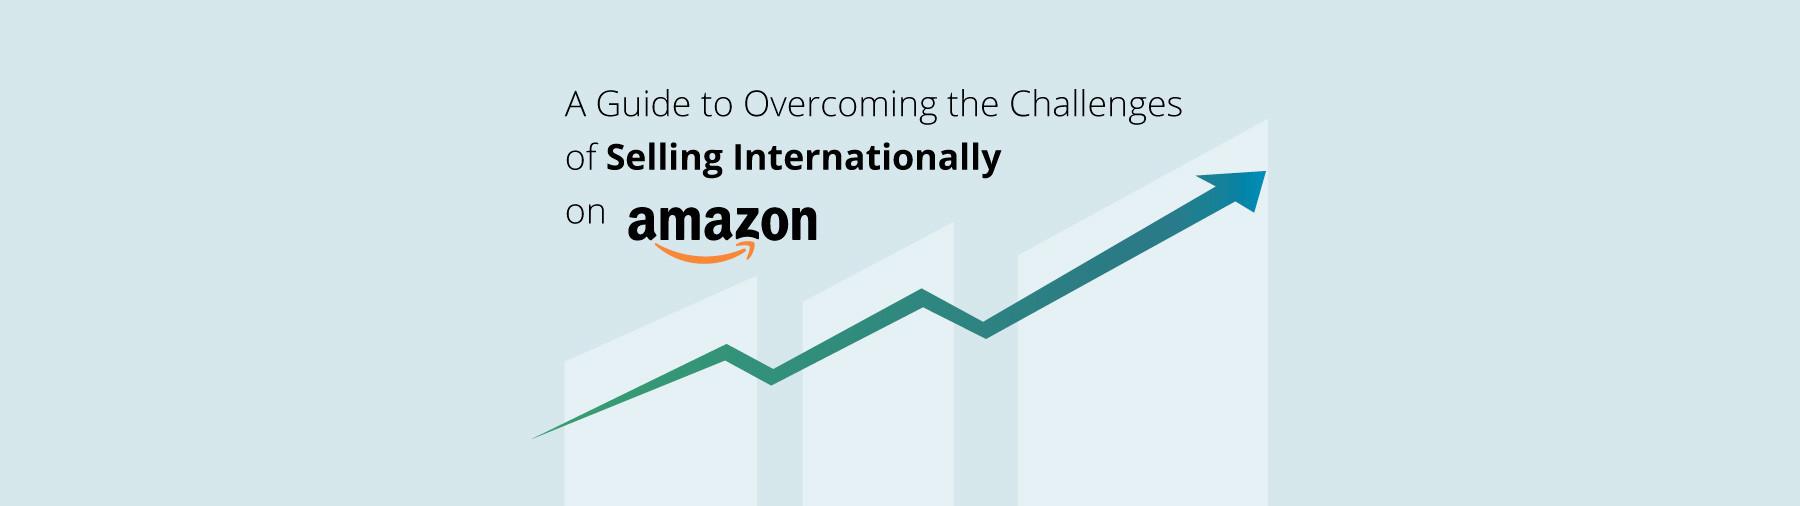 Selling Internationally on Amazon